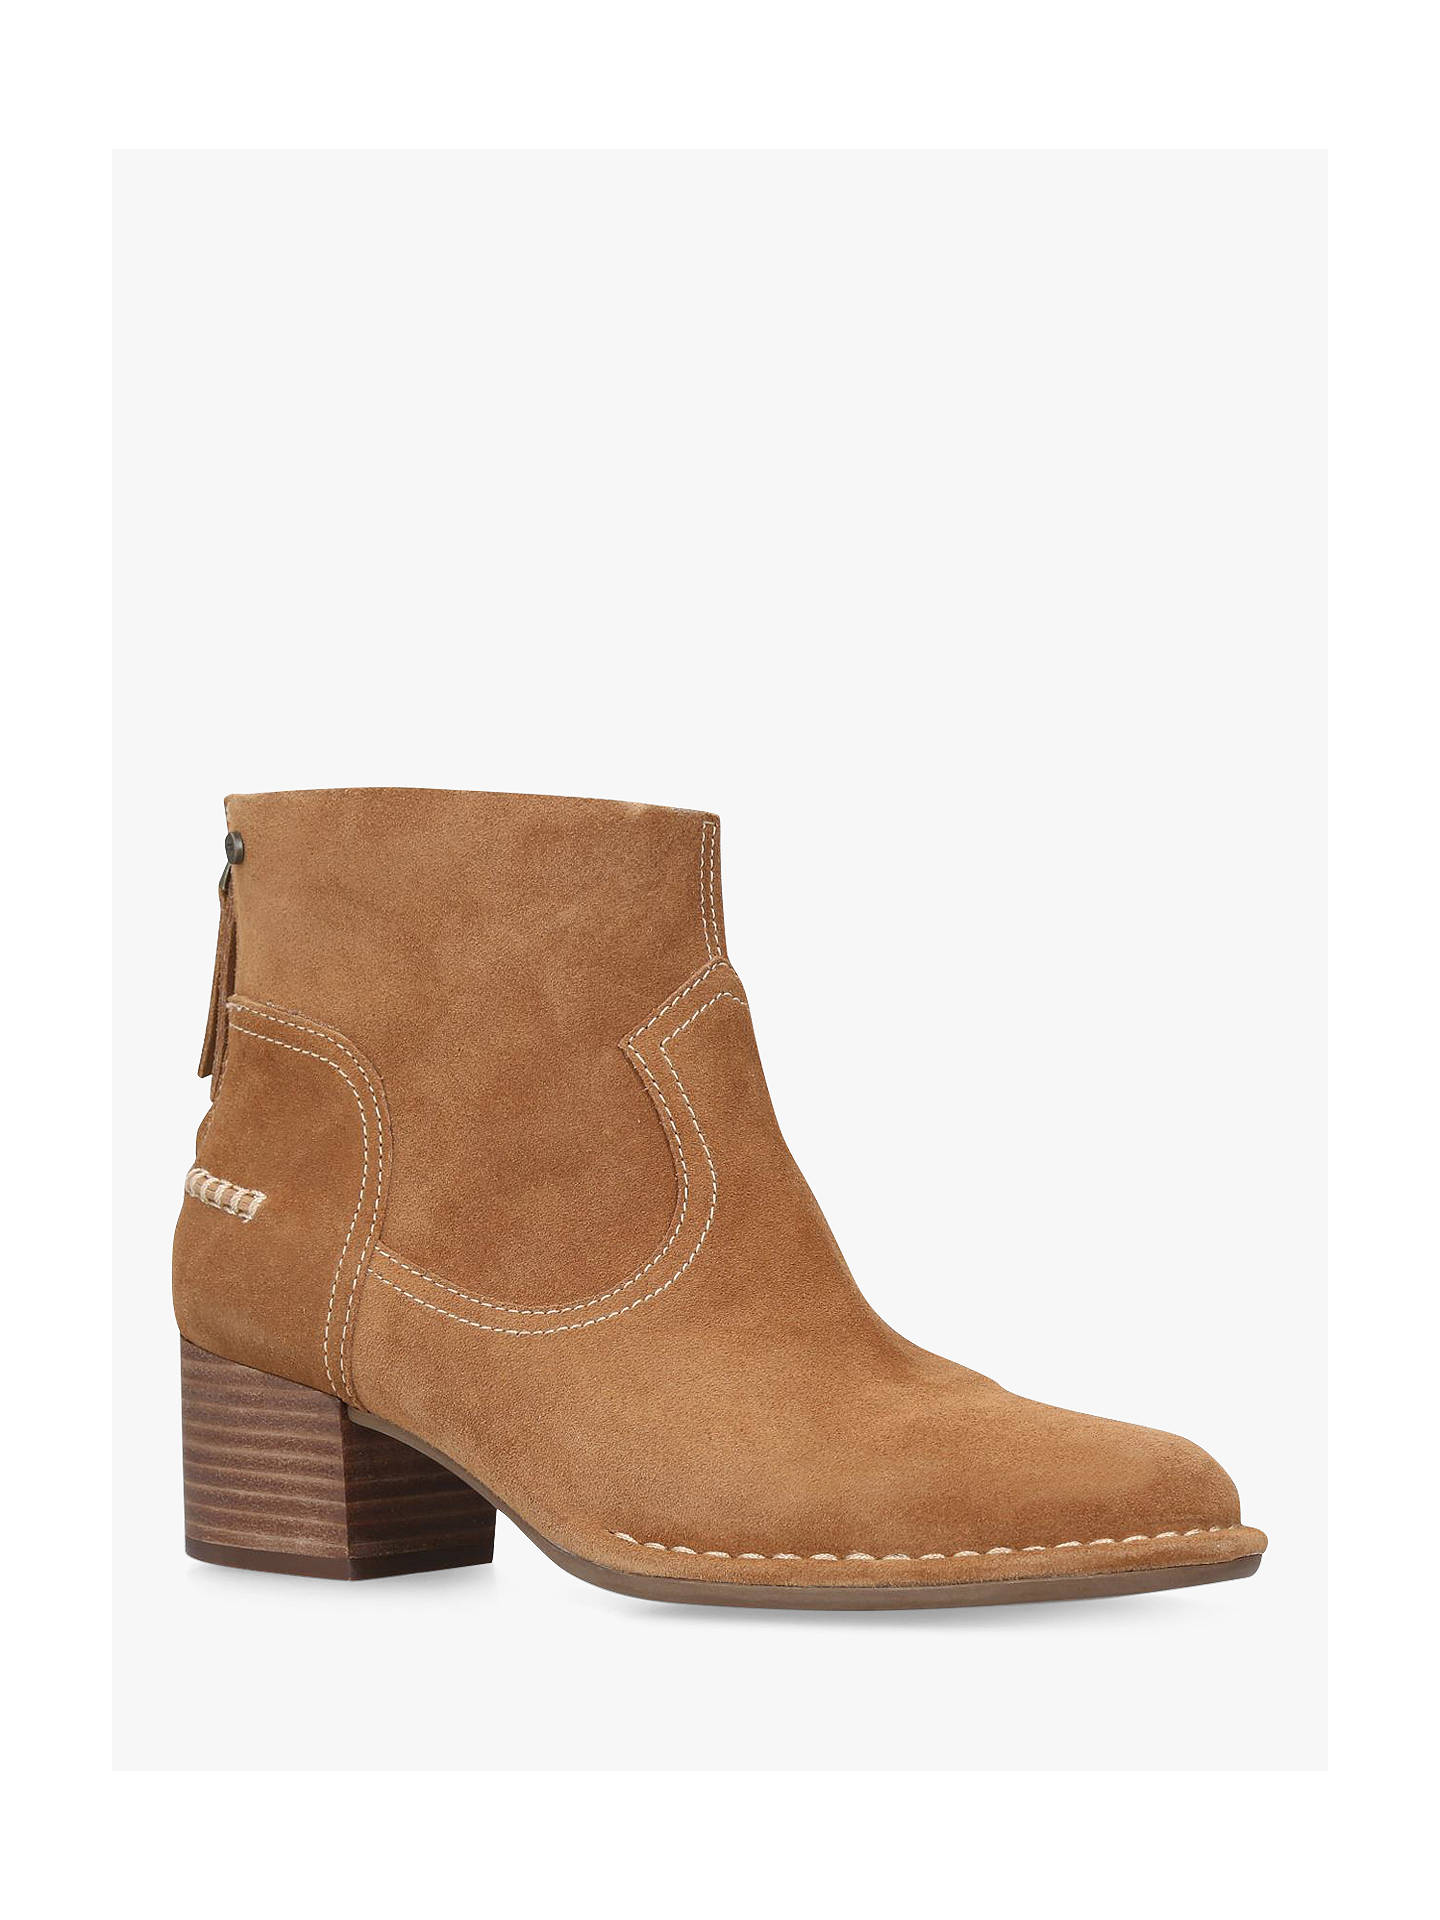 78243e99202 UGG Bandara Block Heel Ankle Boots at John Lewis & Partners